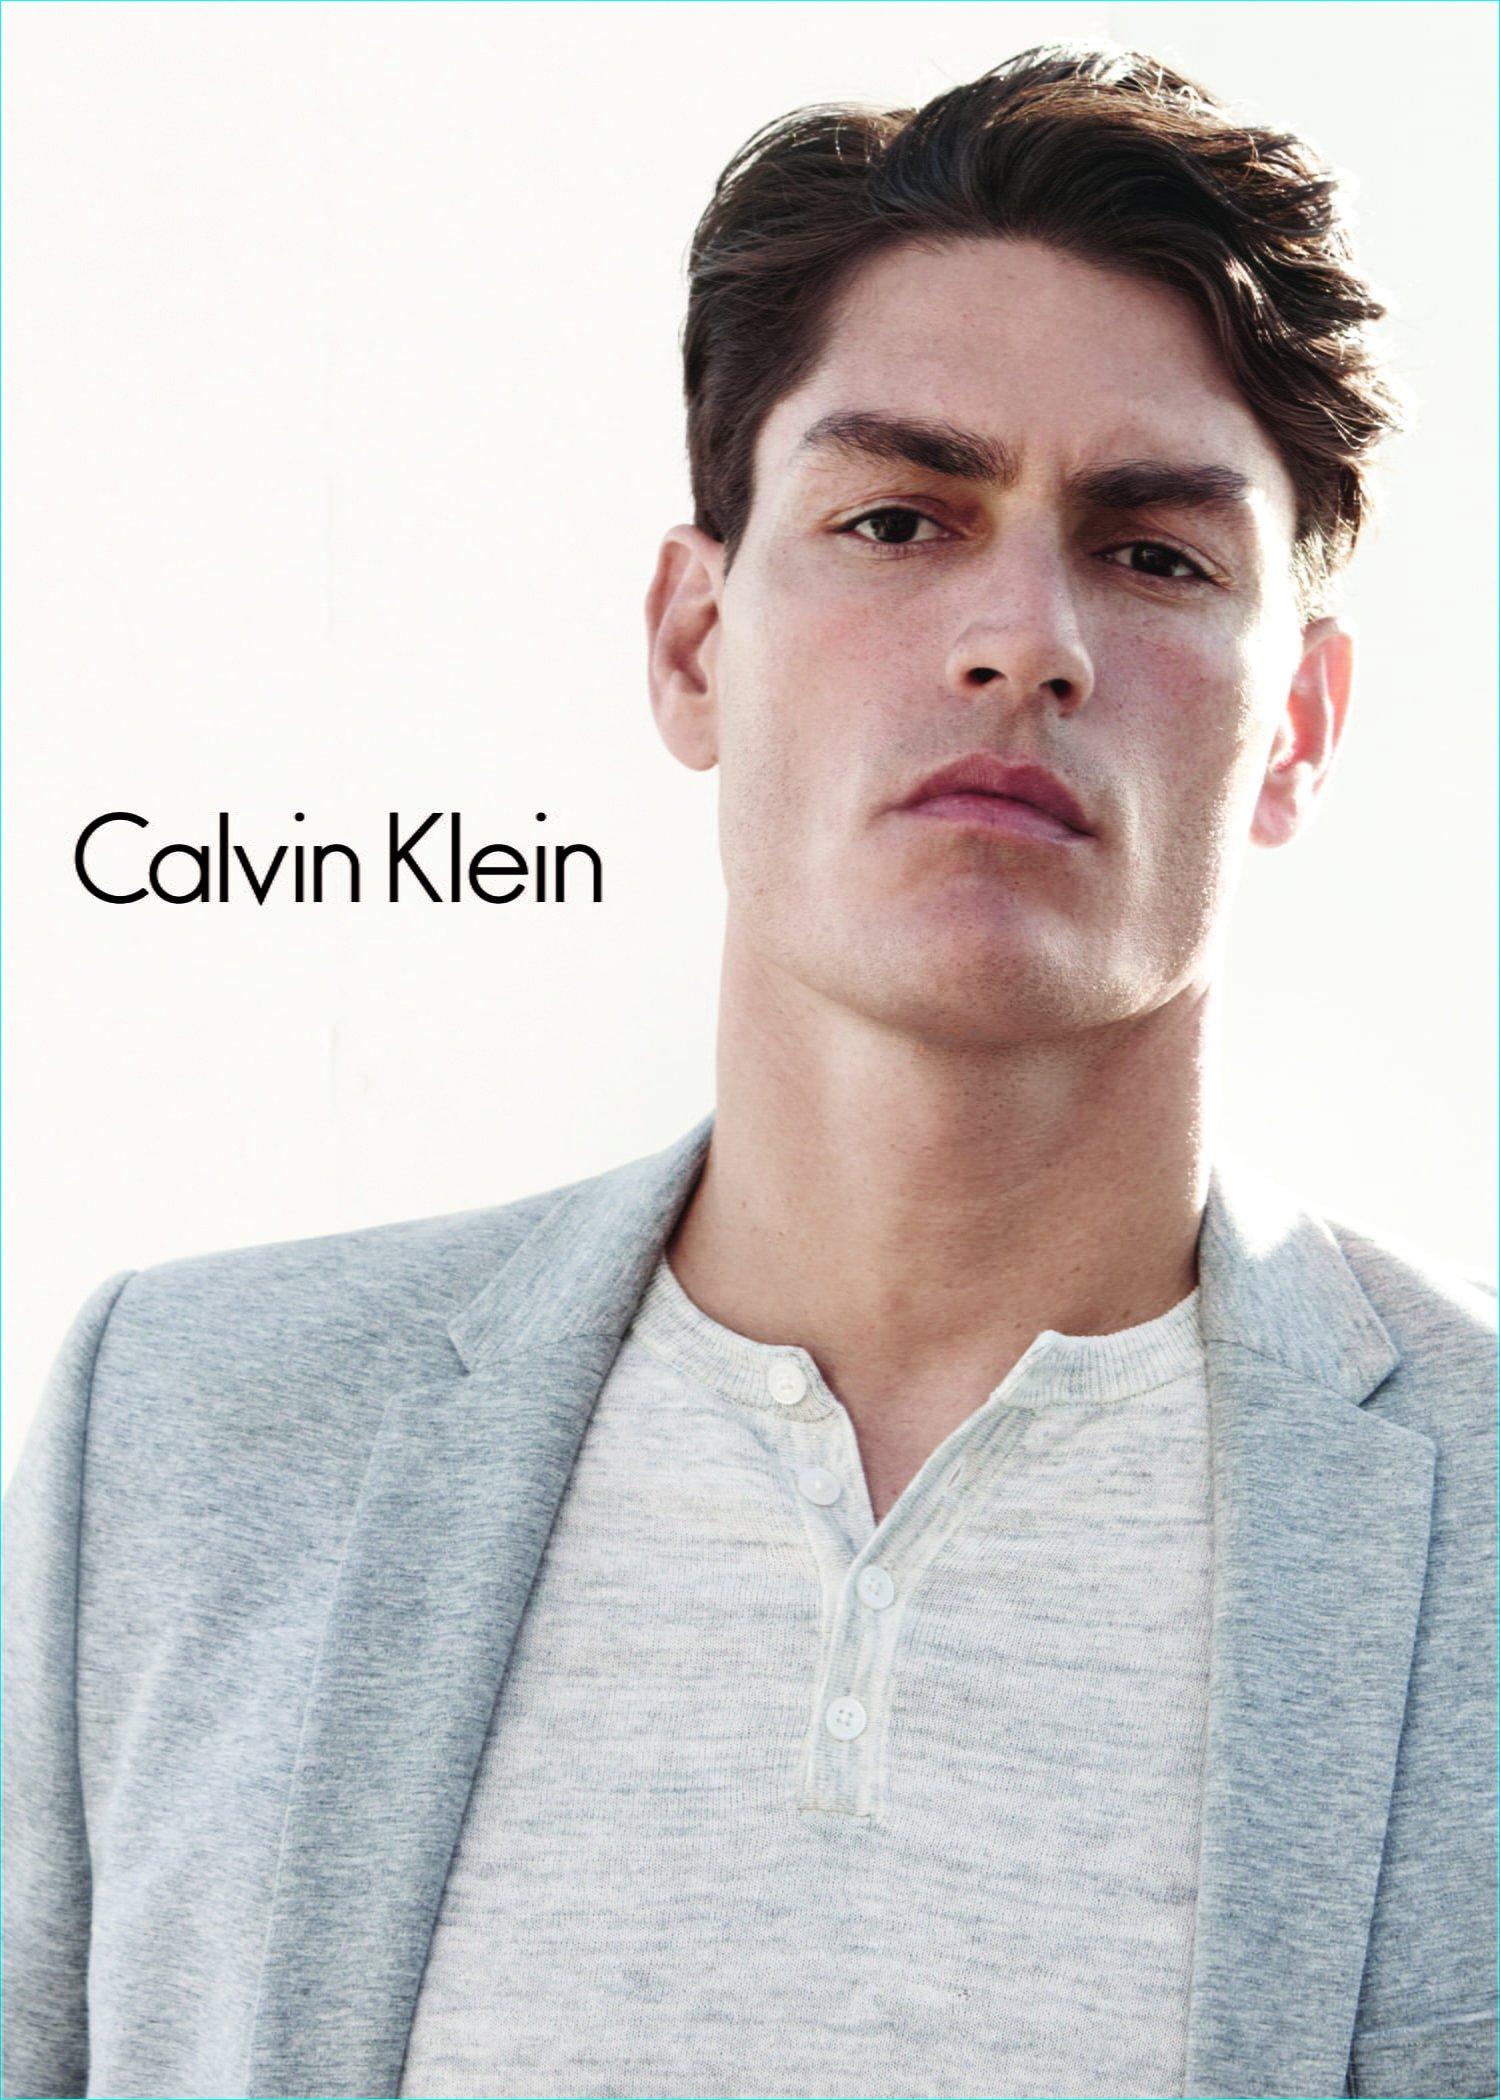 calvin-klein-white-label-s15-m_ph_dan-jackson_sg11